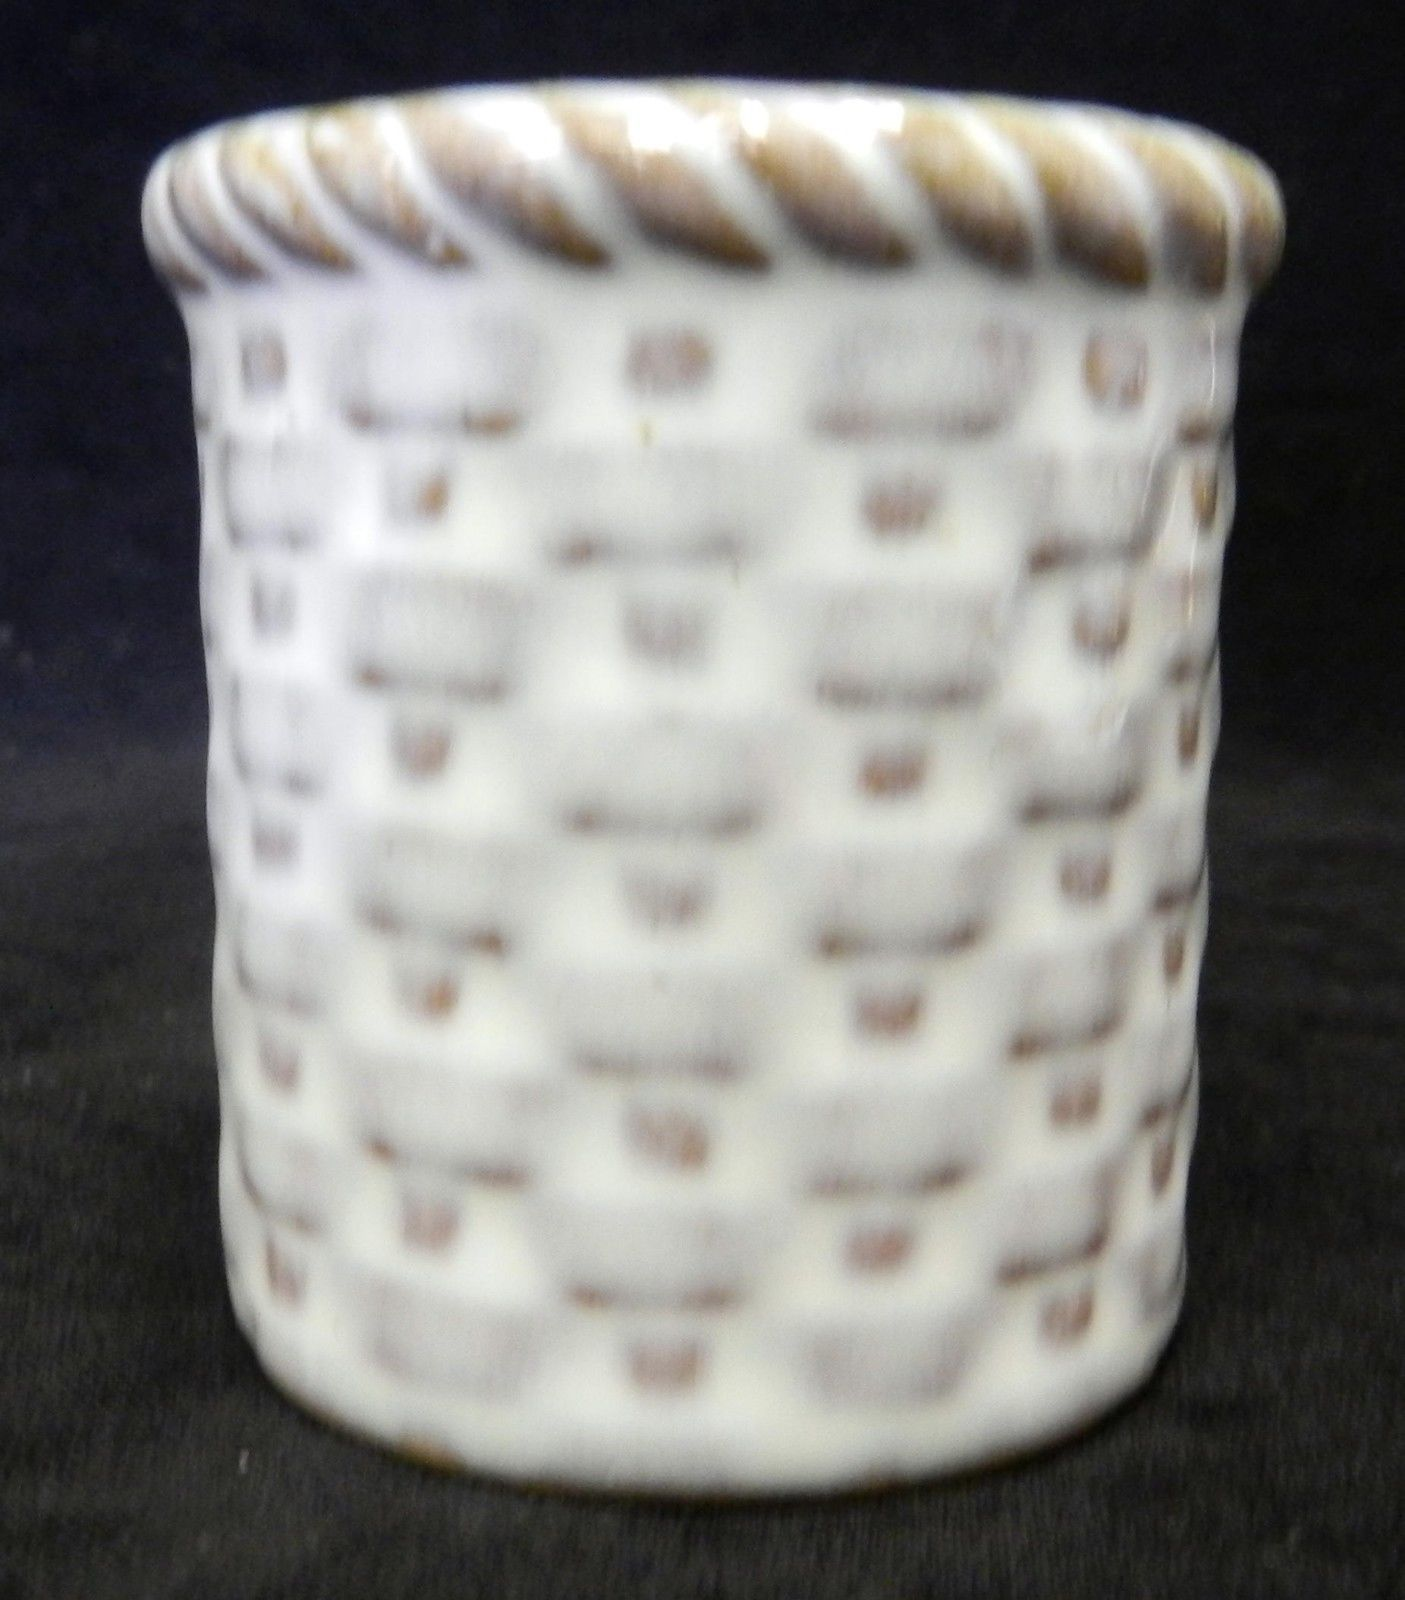 Vintage Karol Western Las Vegas Nv Cactus Dice Basket Souvenir Toothpick Holder Nevada